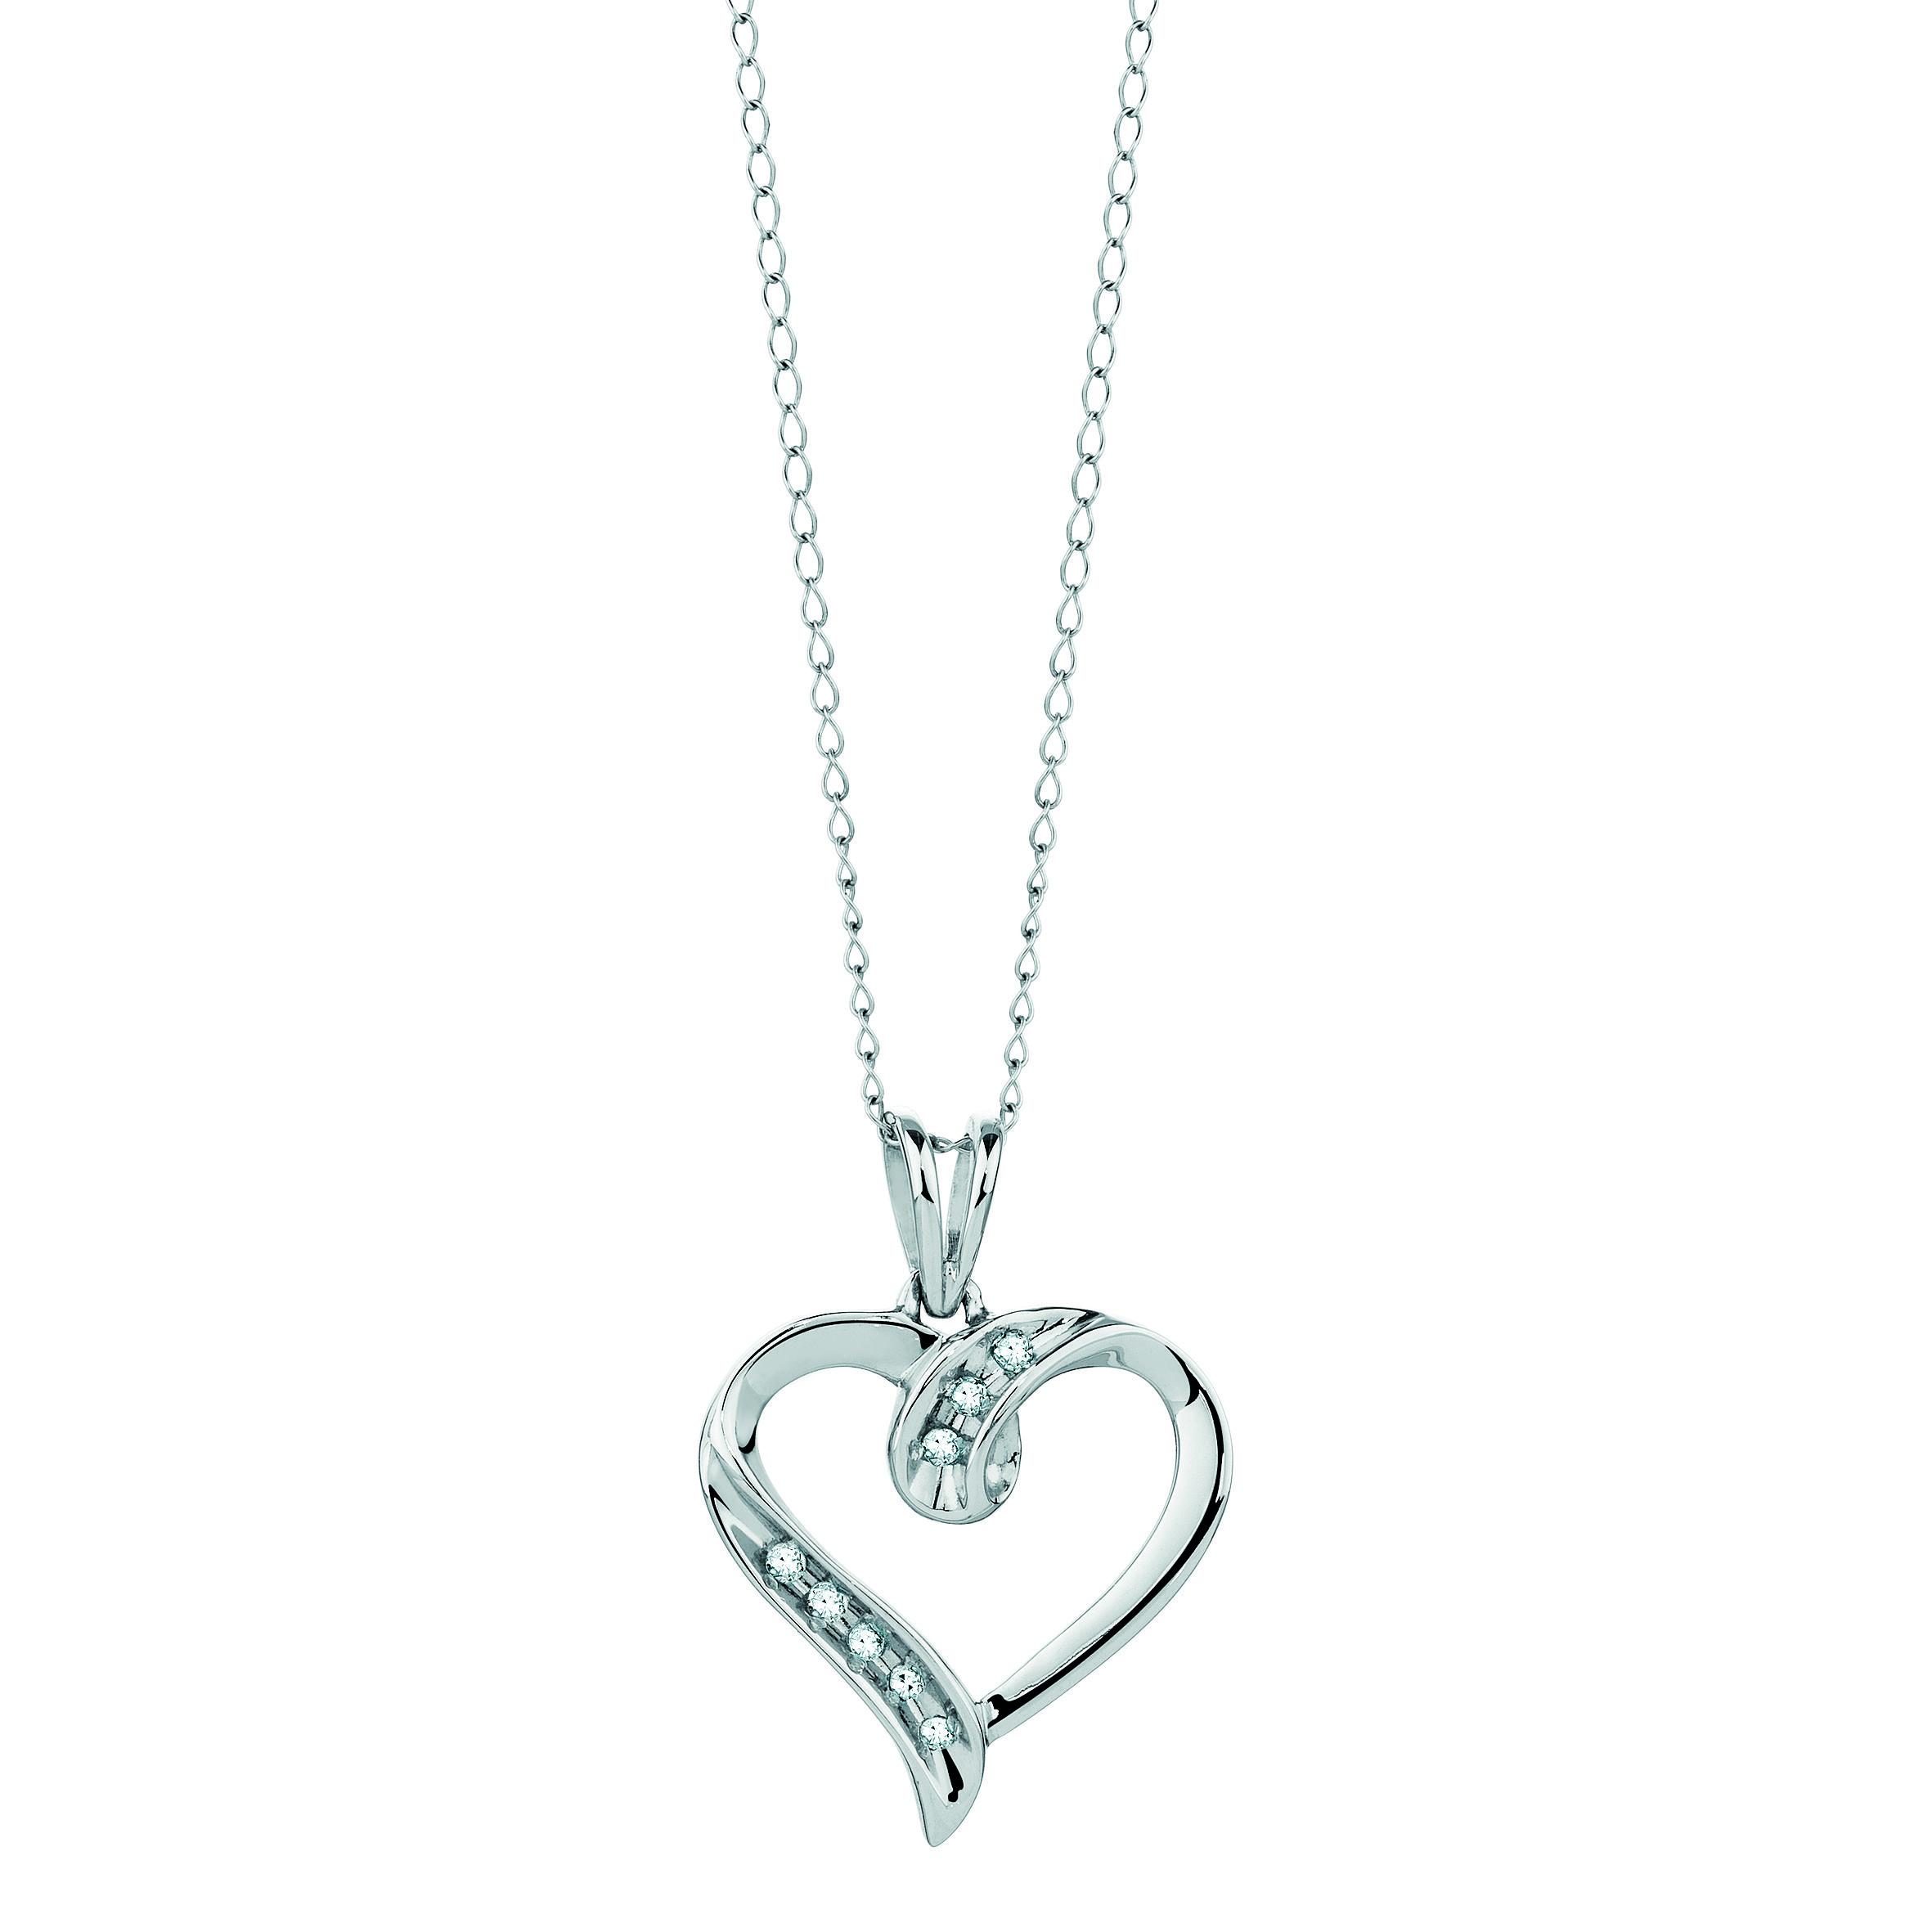 Michael hill diamond heart pendant 459 pendants pinterest michael hill diamond heart pendant 459 mozeypictures Gallery